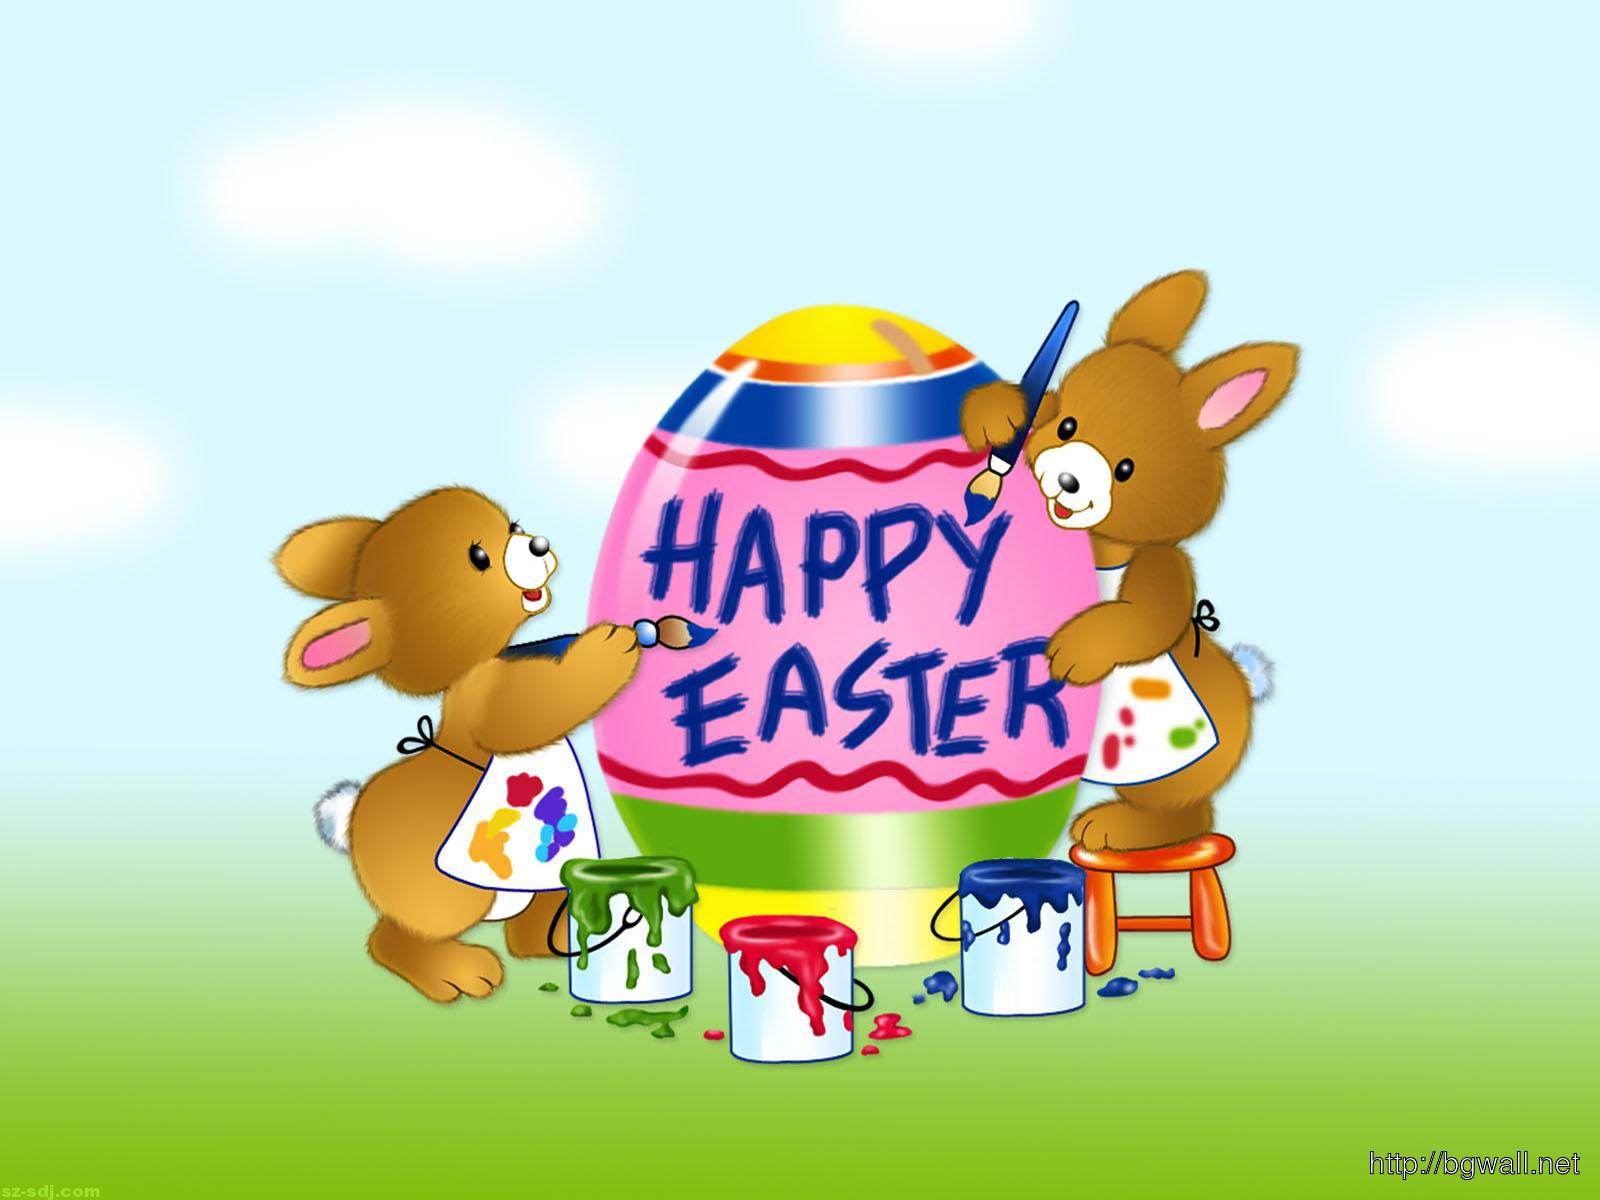 bunny-easter-2014-desktop-wallpaper